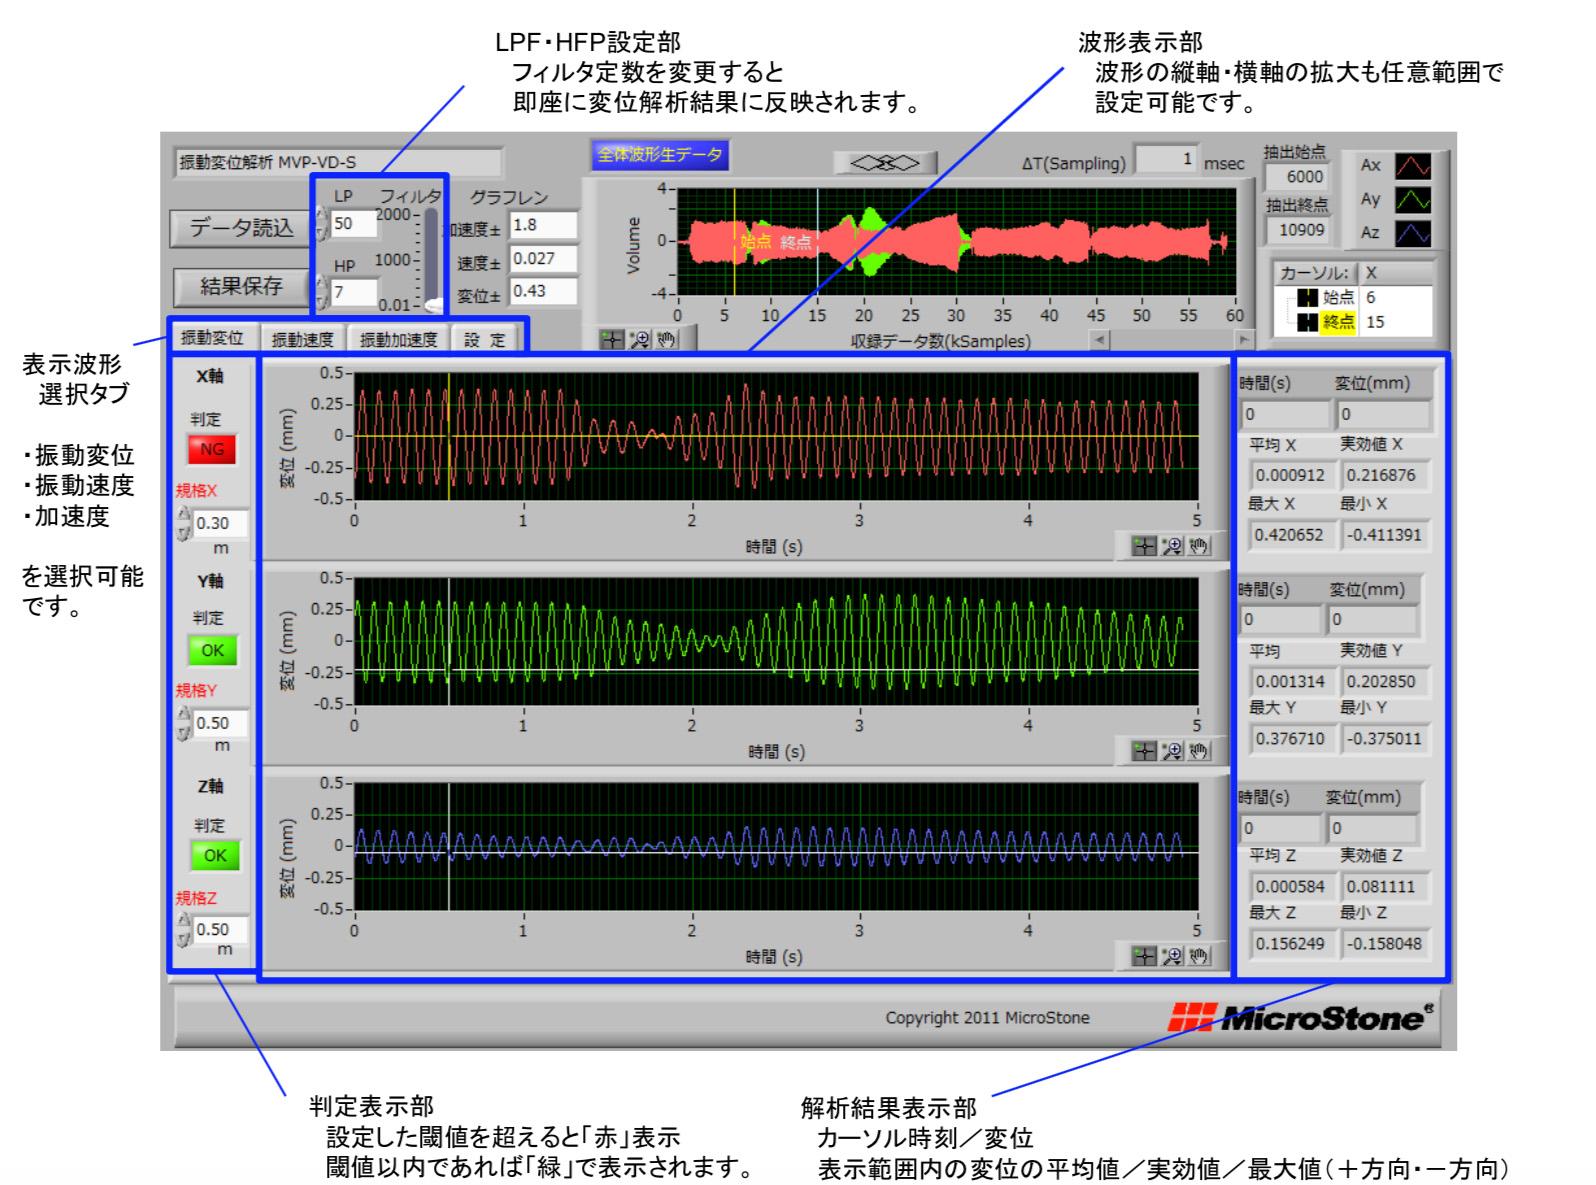 MVP-VD2-S 画面イメージ・機能説明